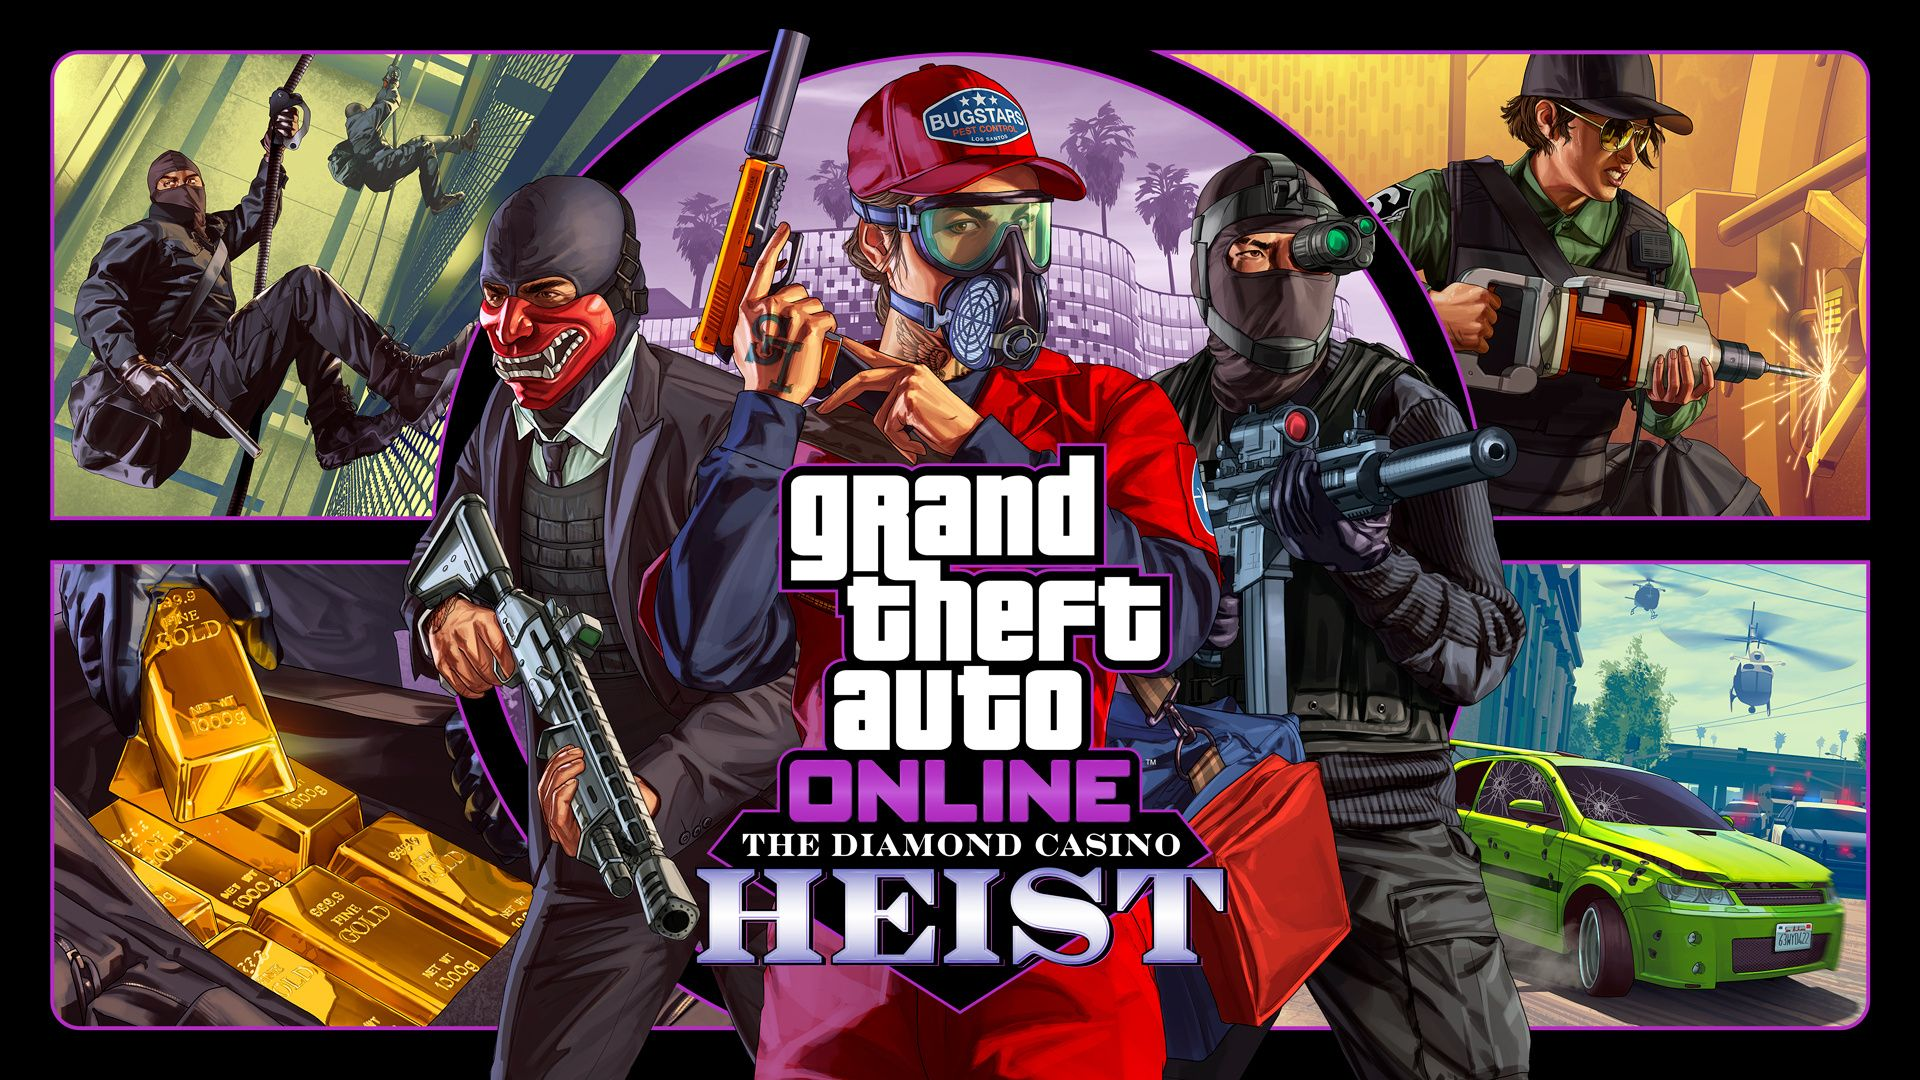 Gta Online Le Braquage Du Diamond Casino Arrive La Semaine Prochaine En 2020 Braquage Grand Theft Auto Les Infiltres